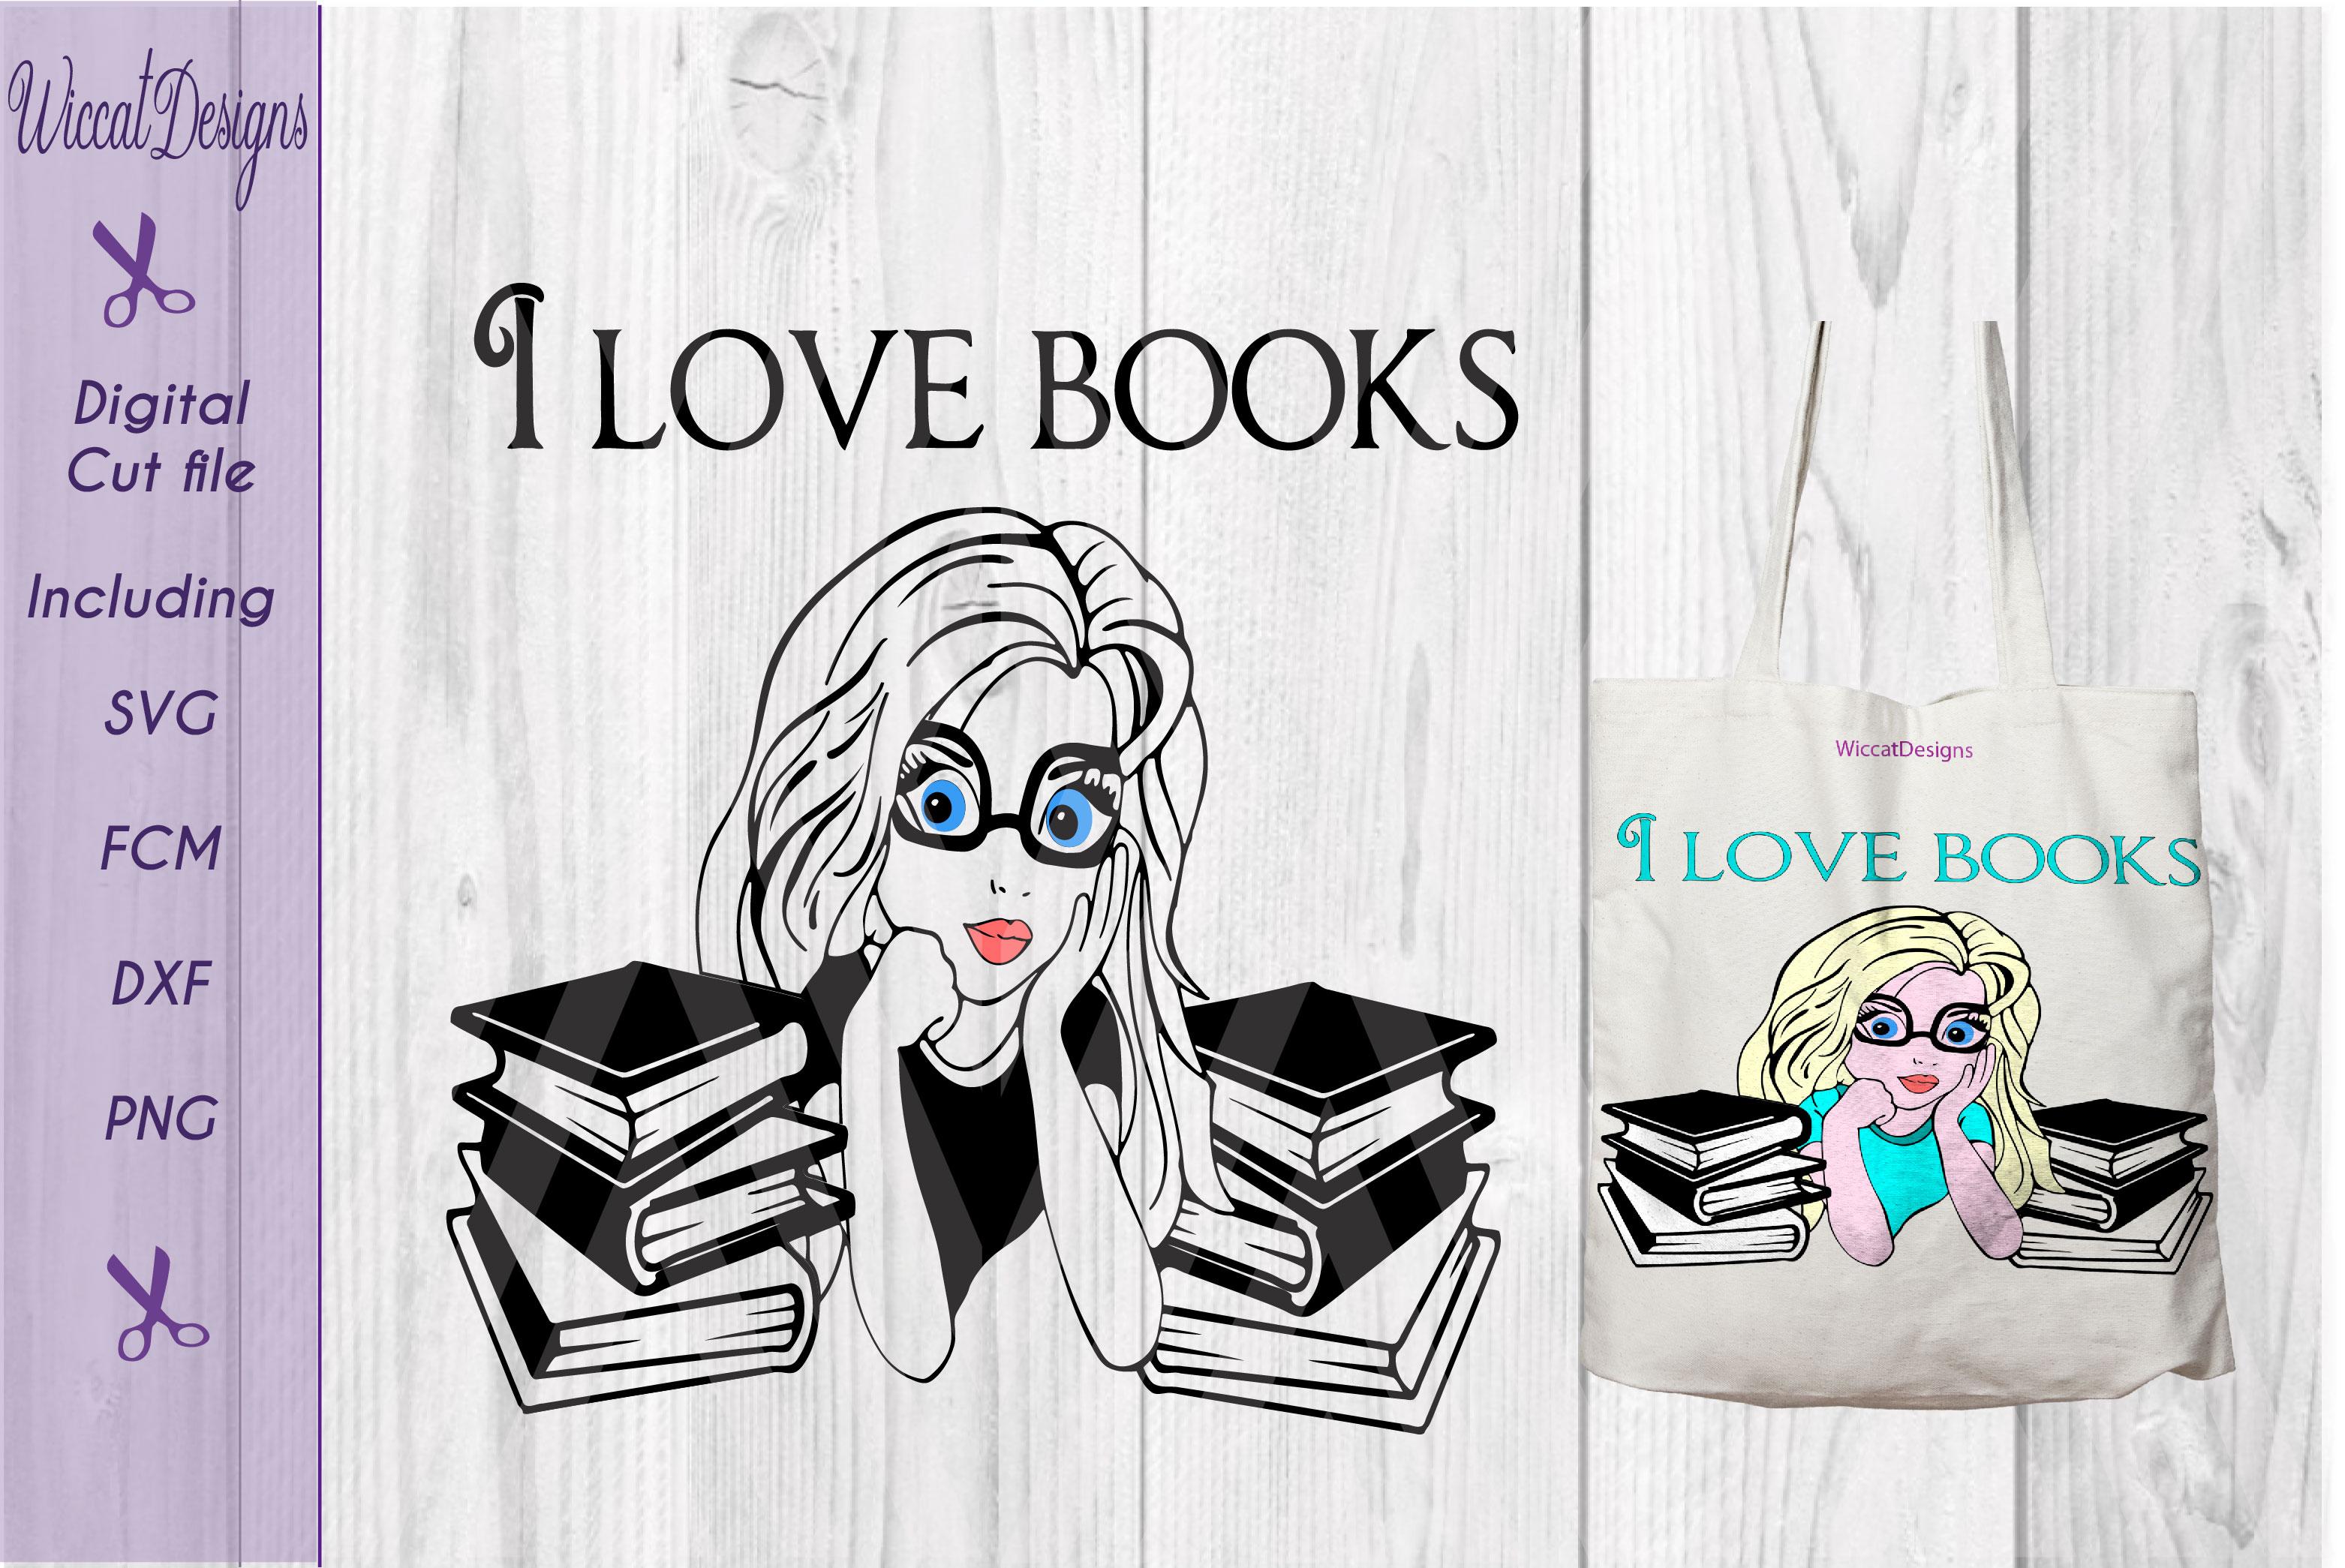 Bookworm svg, librarian character, cartoon cut files